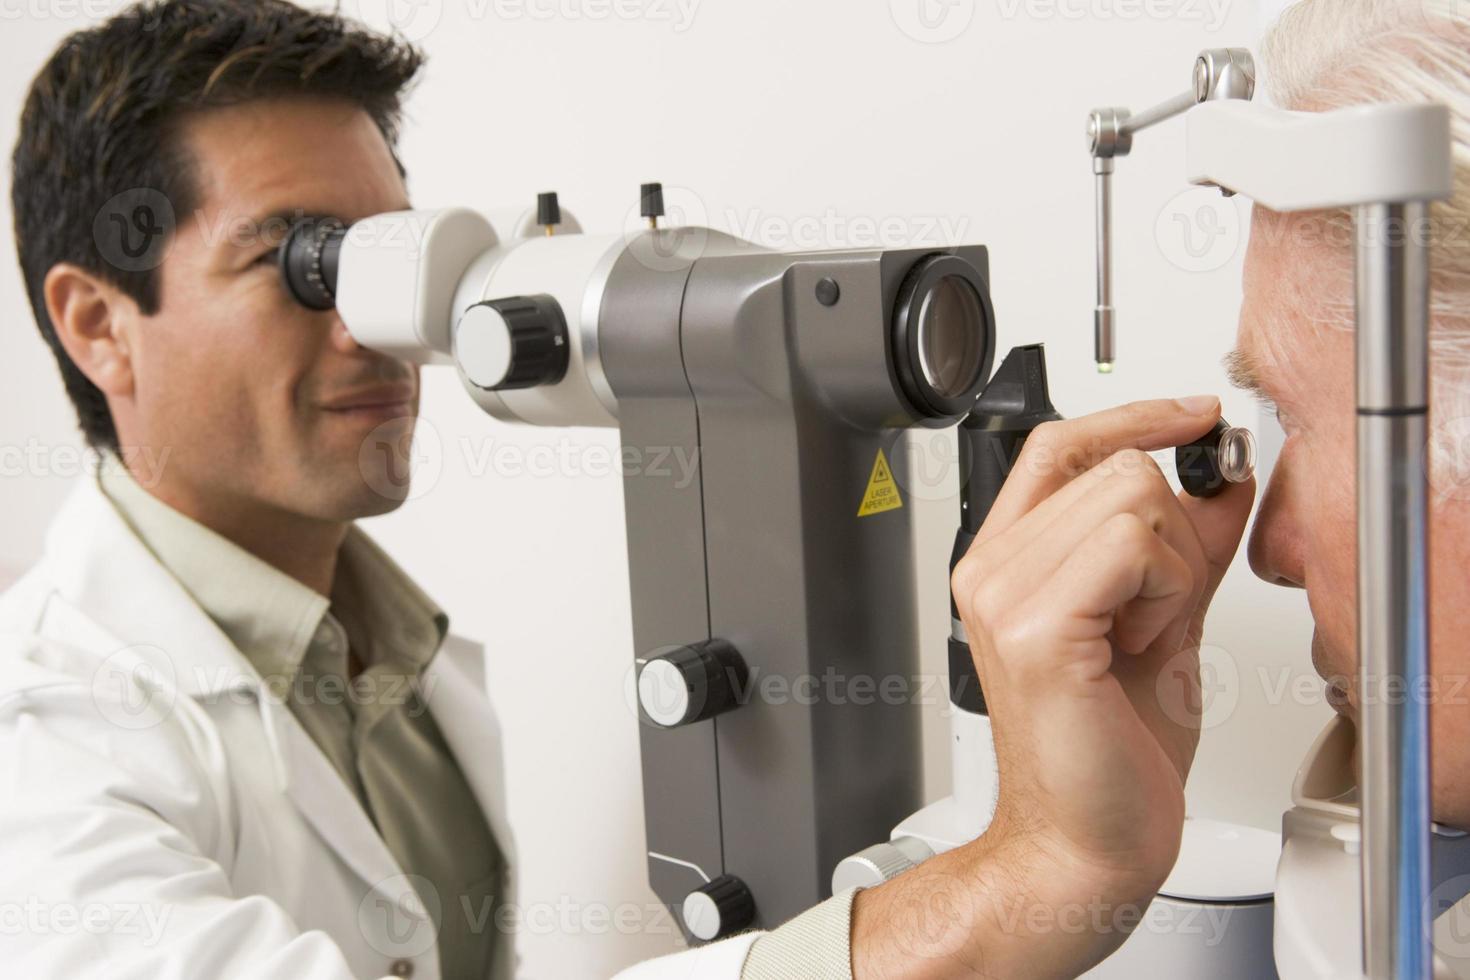 läkare som kontrollerar patientens ögon foto